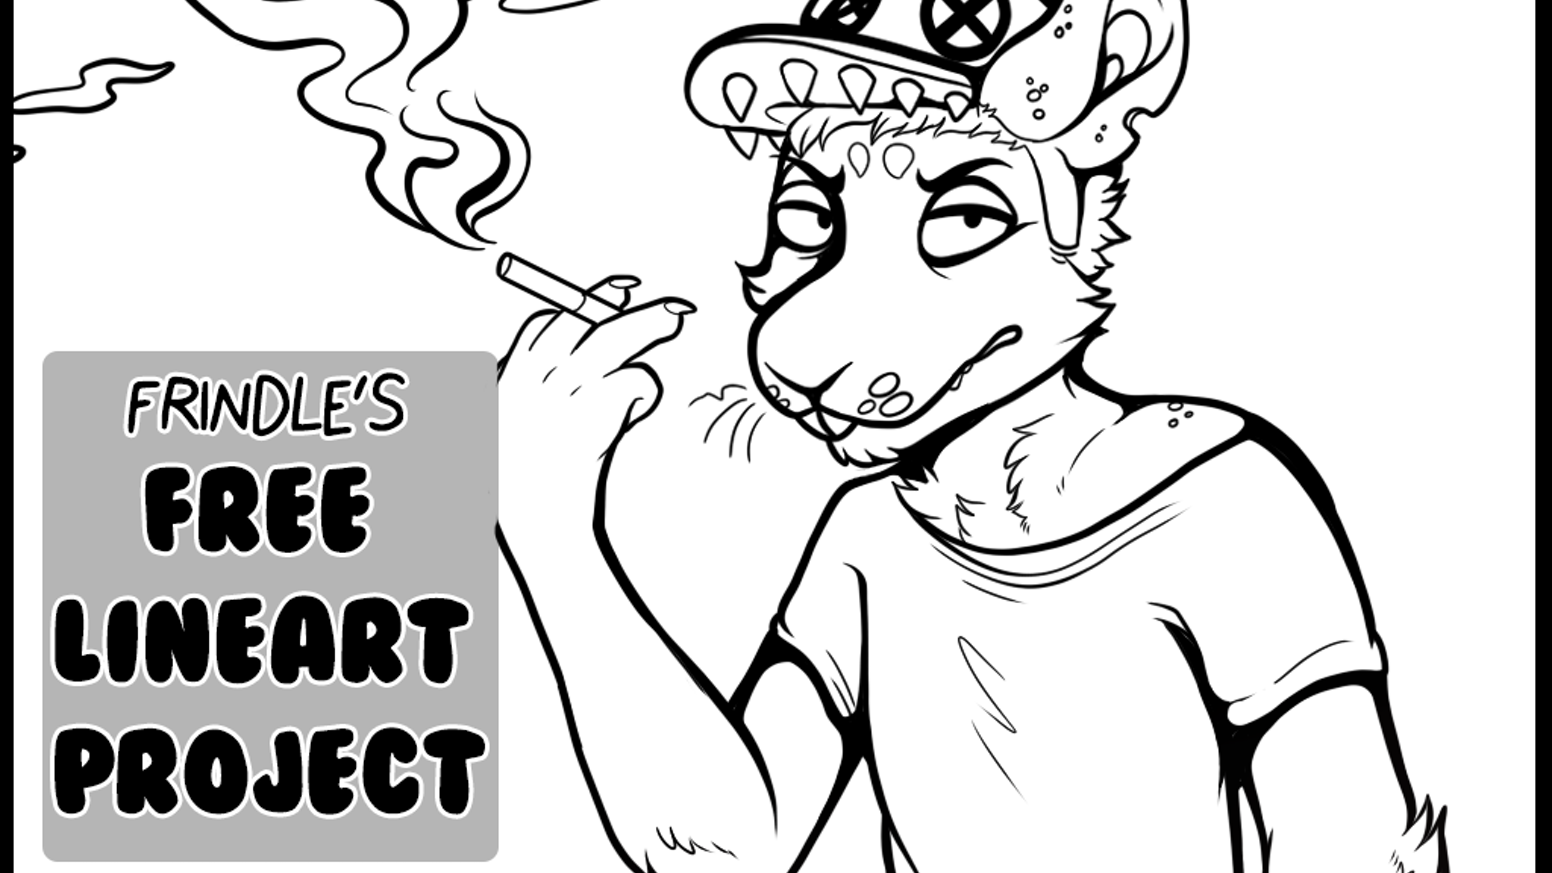 free lineart project by frindle kickstarter